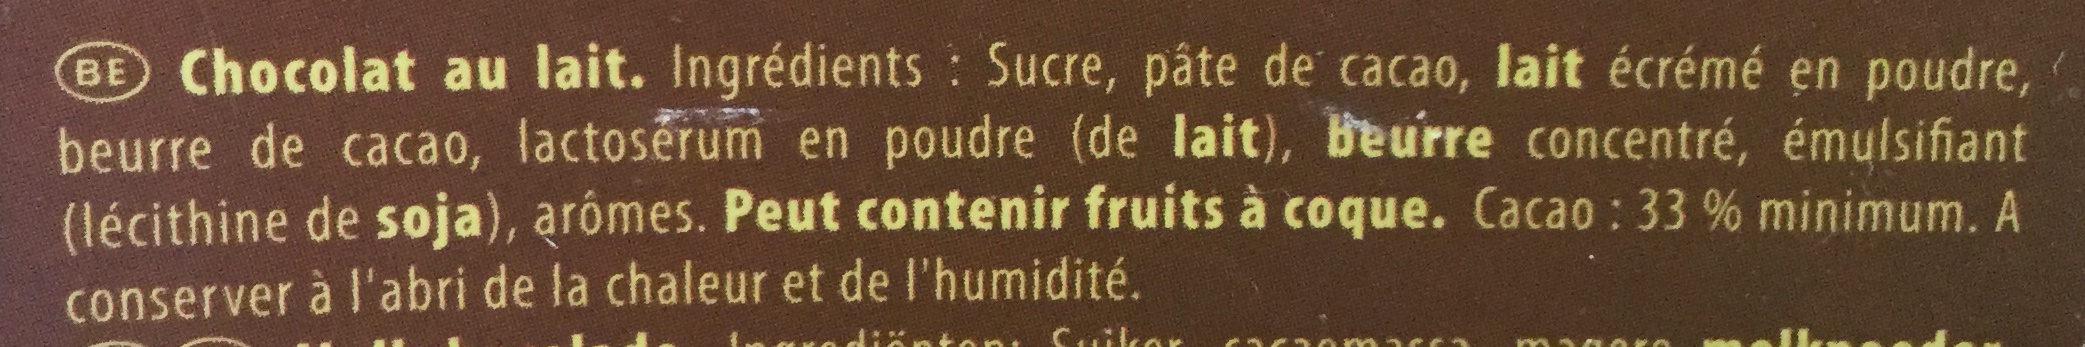 Chocolat au Lait - Ingredients - fr